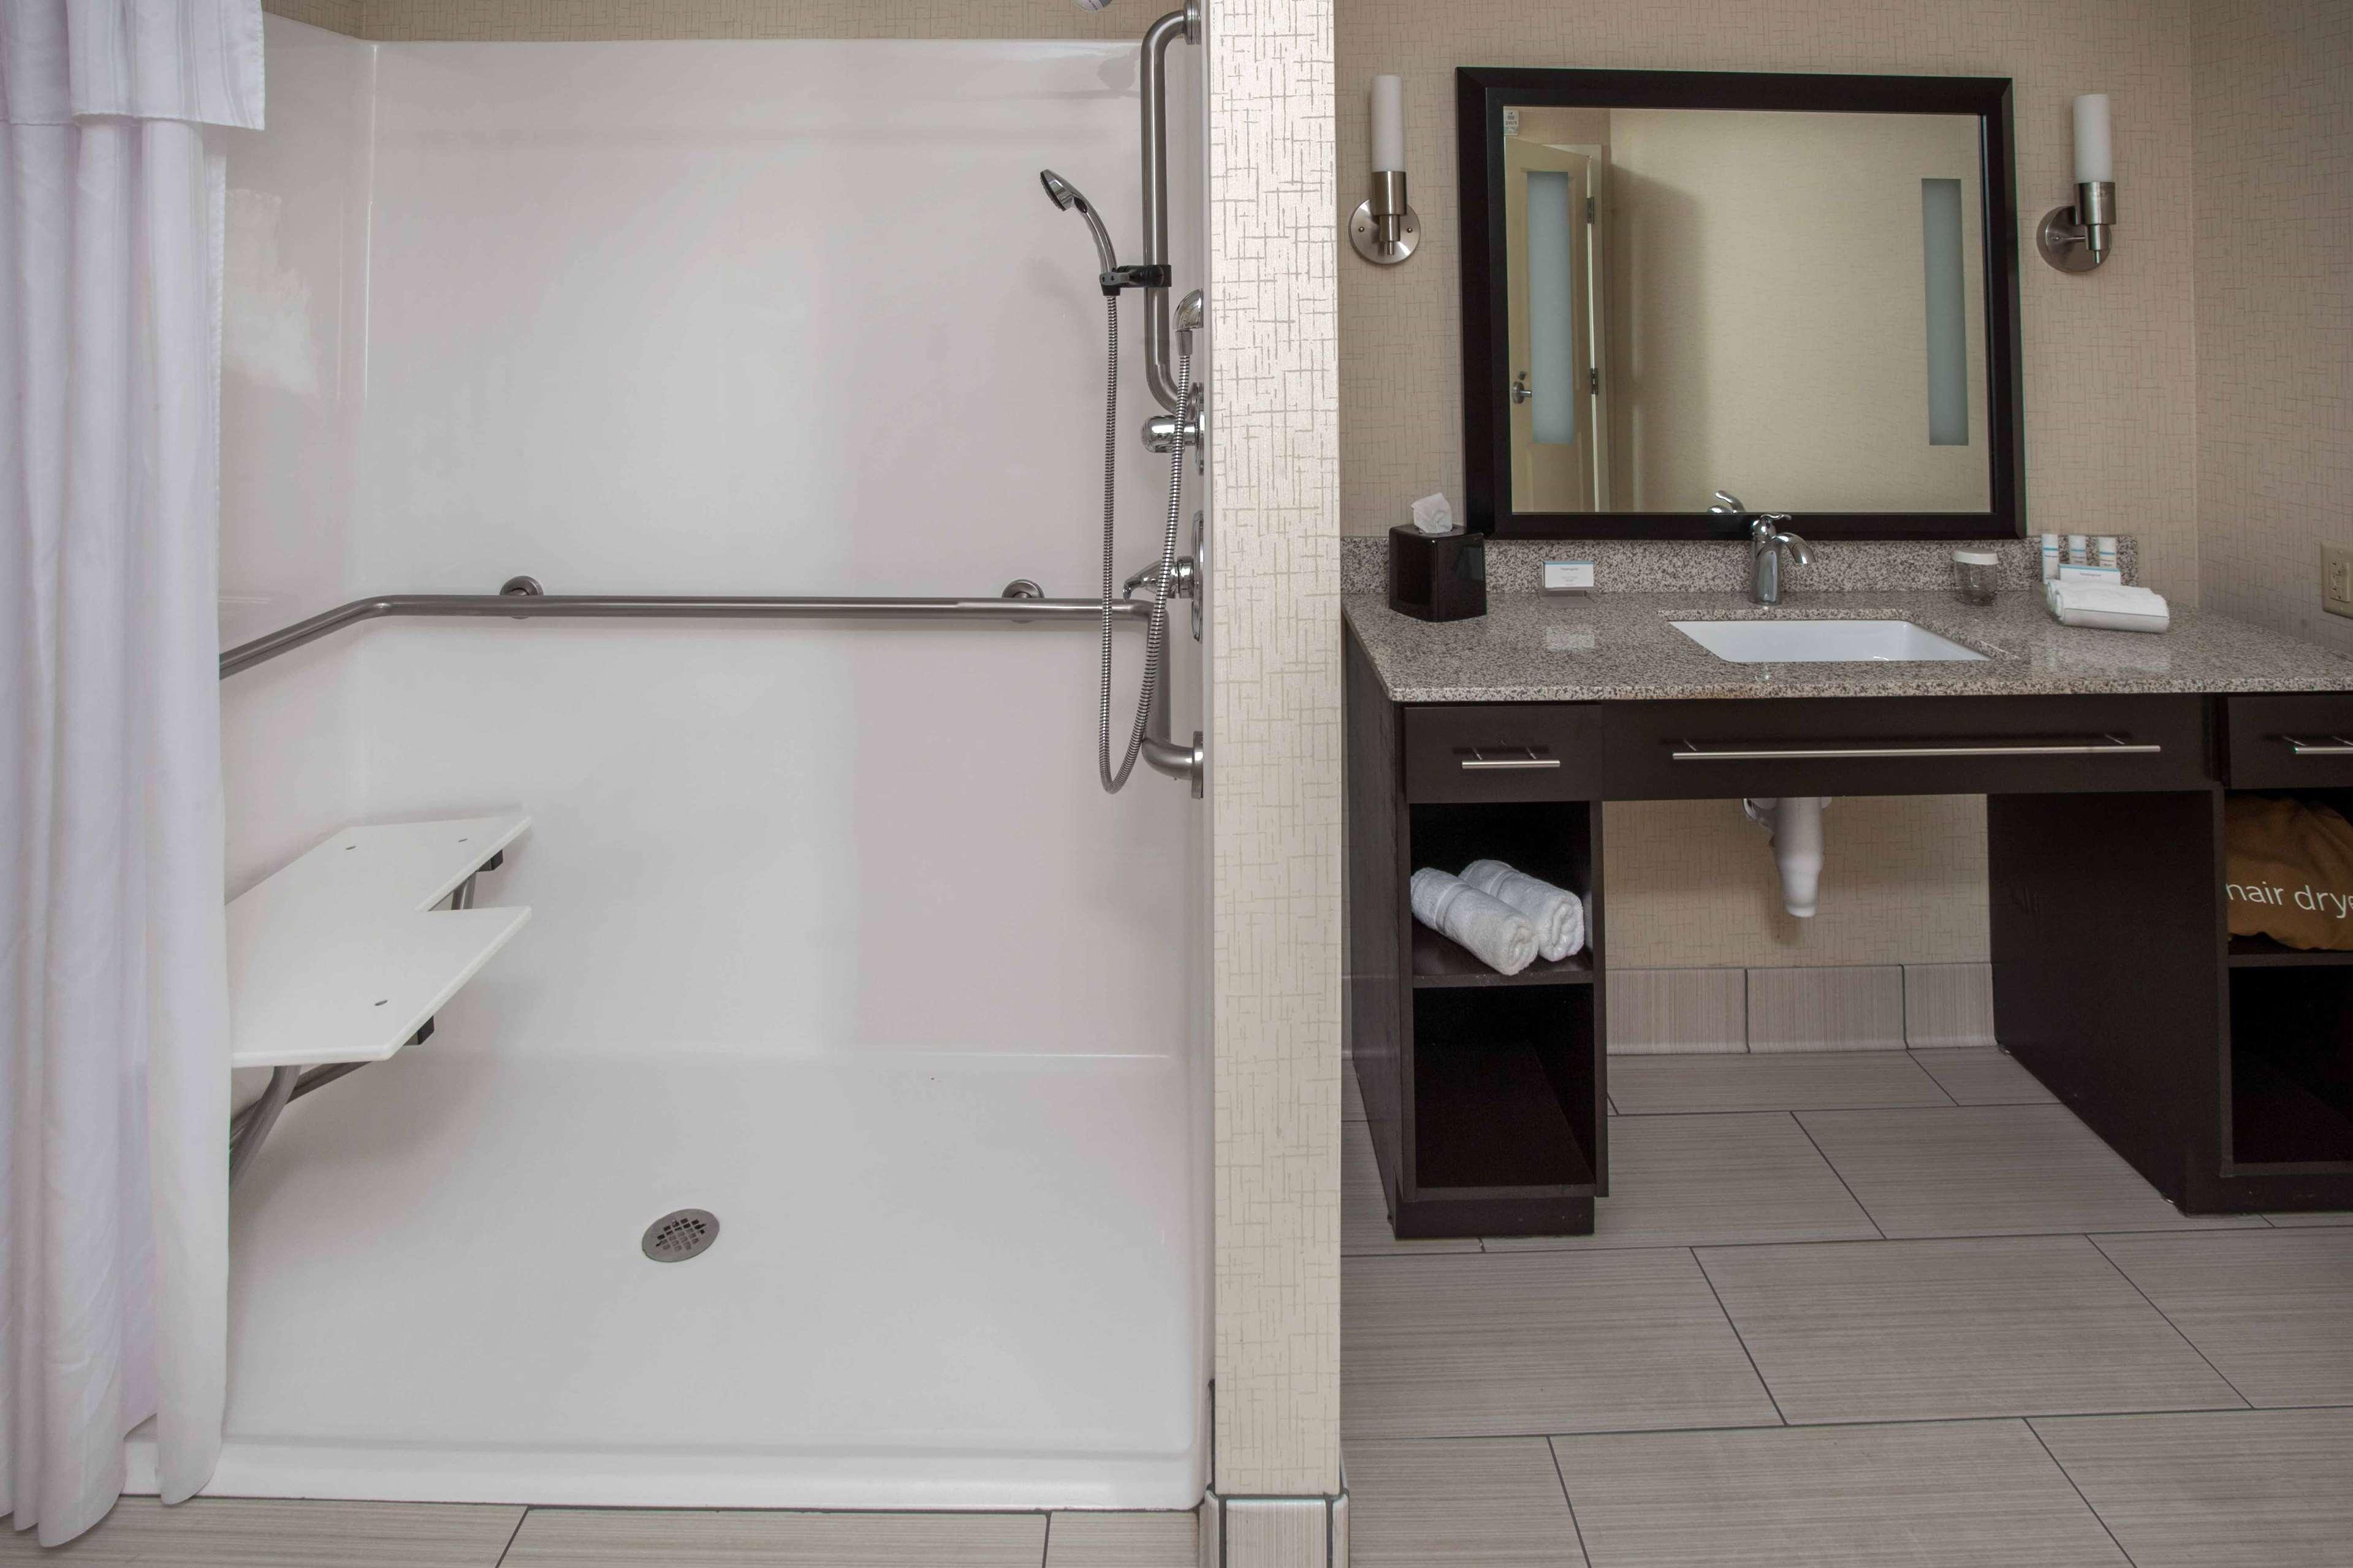 Homewood Suites by Hilton Munster image 4